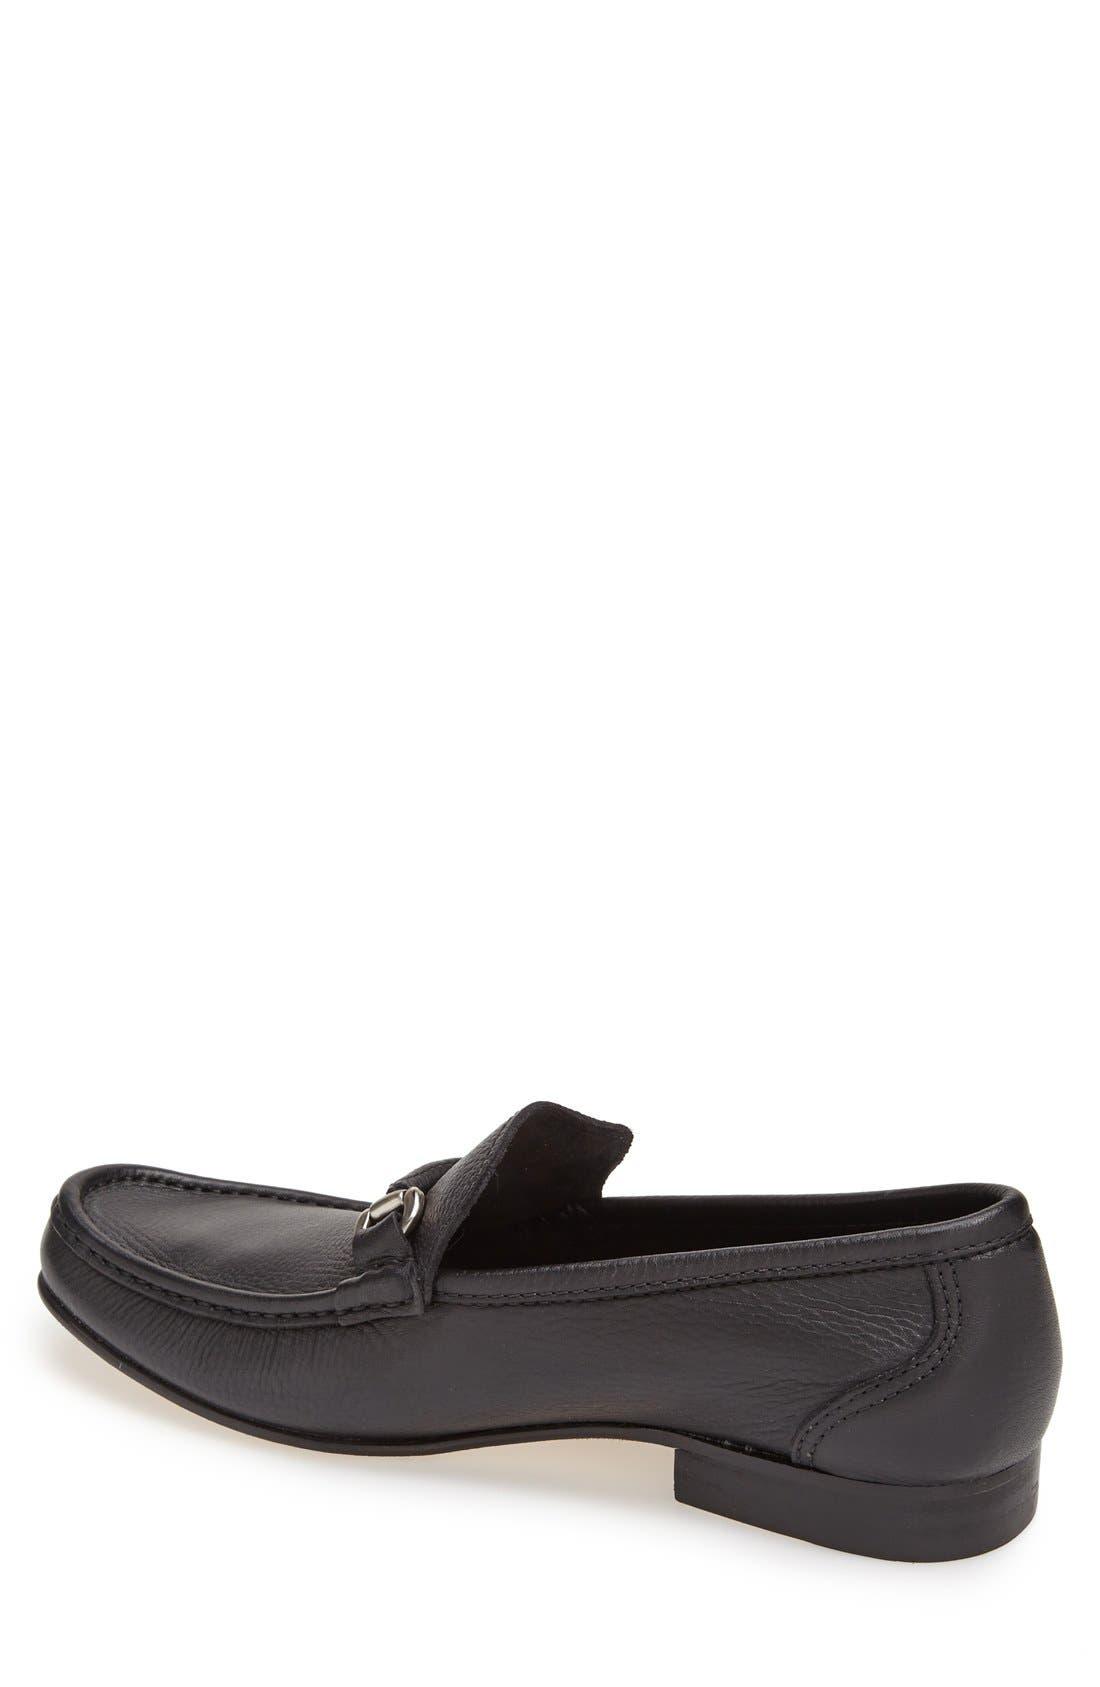 Alternate Image 4  - Sandro Moscoloni 'San Remo' Leather Bit Loafer (Men)